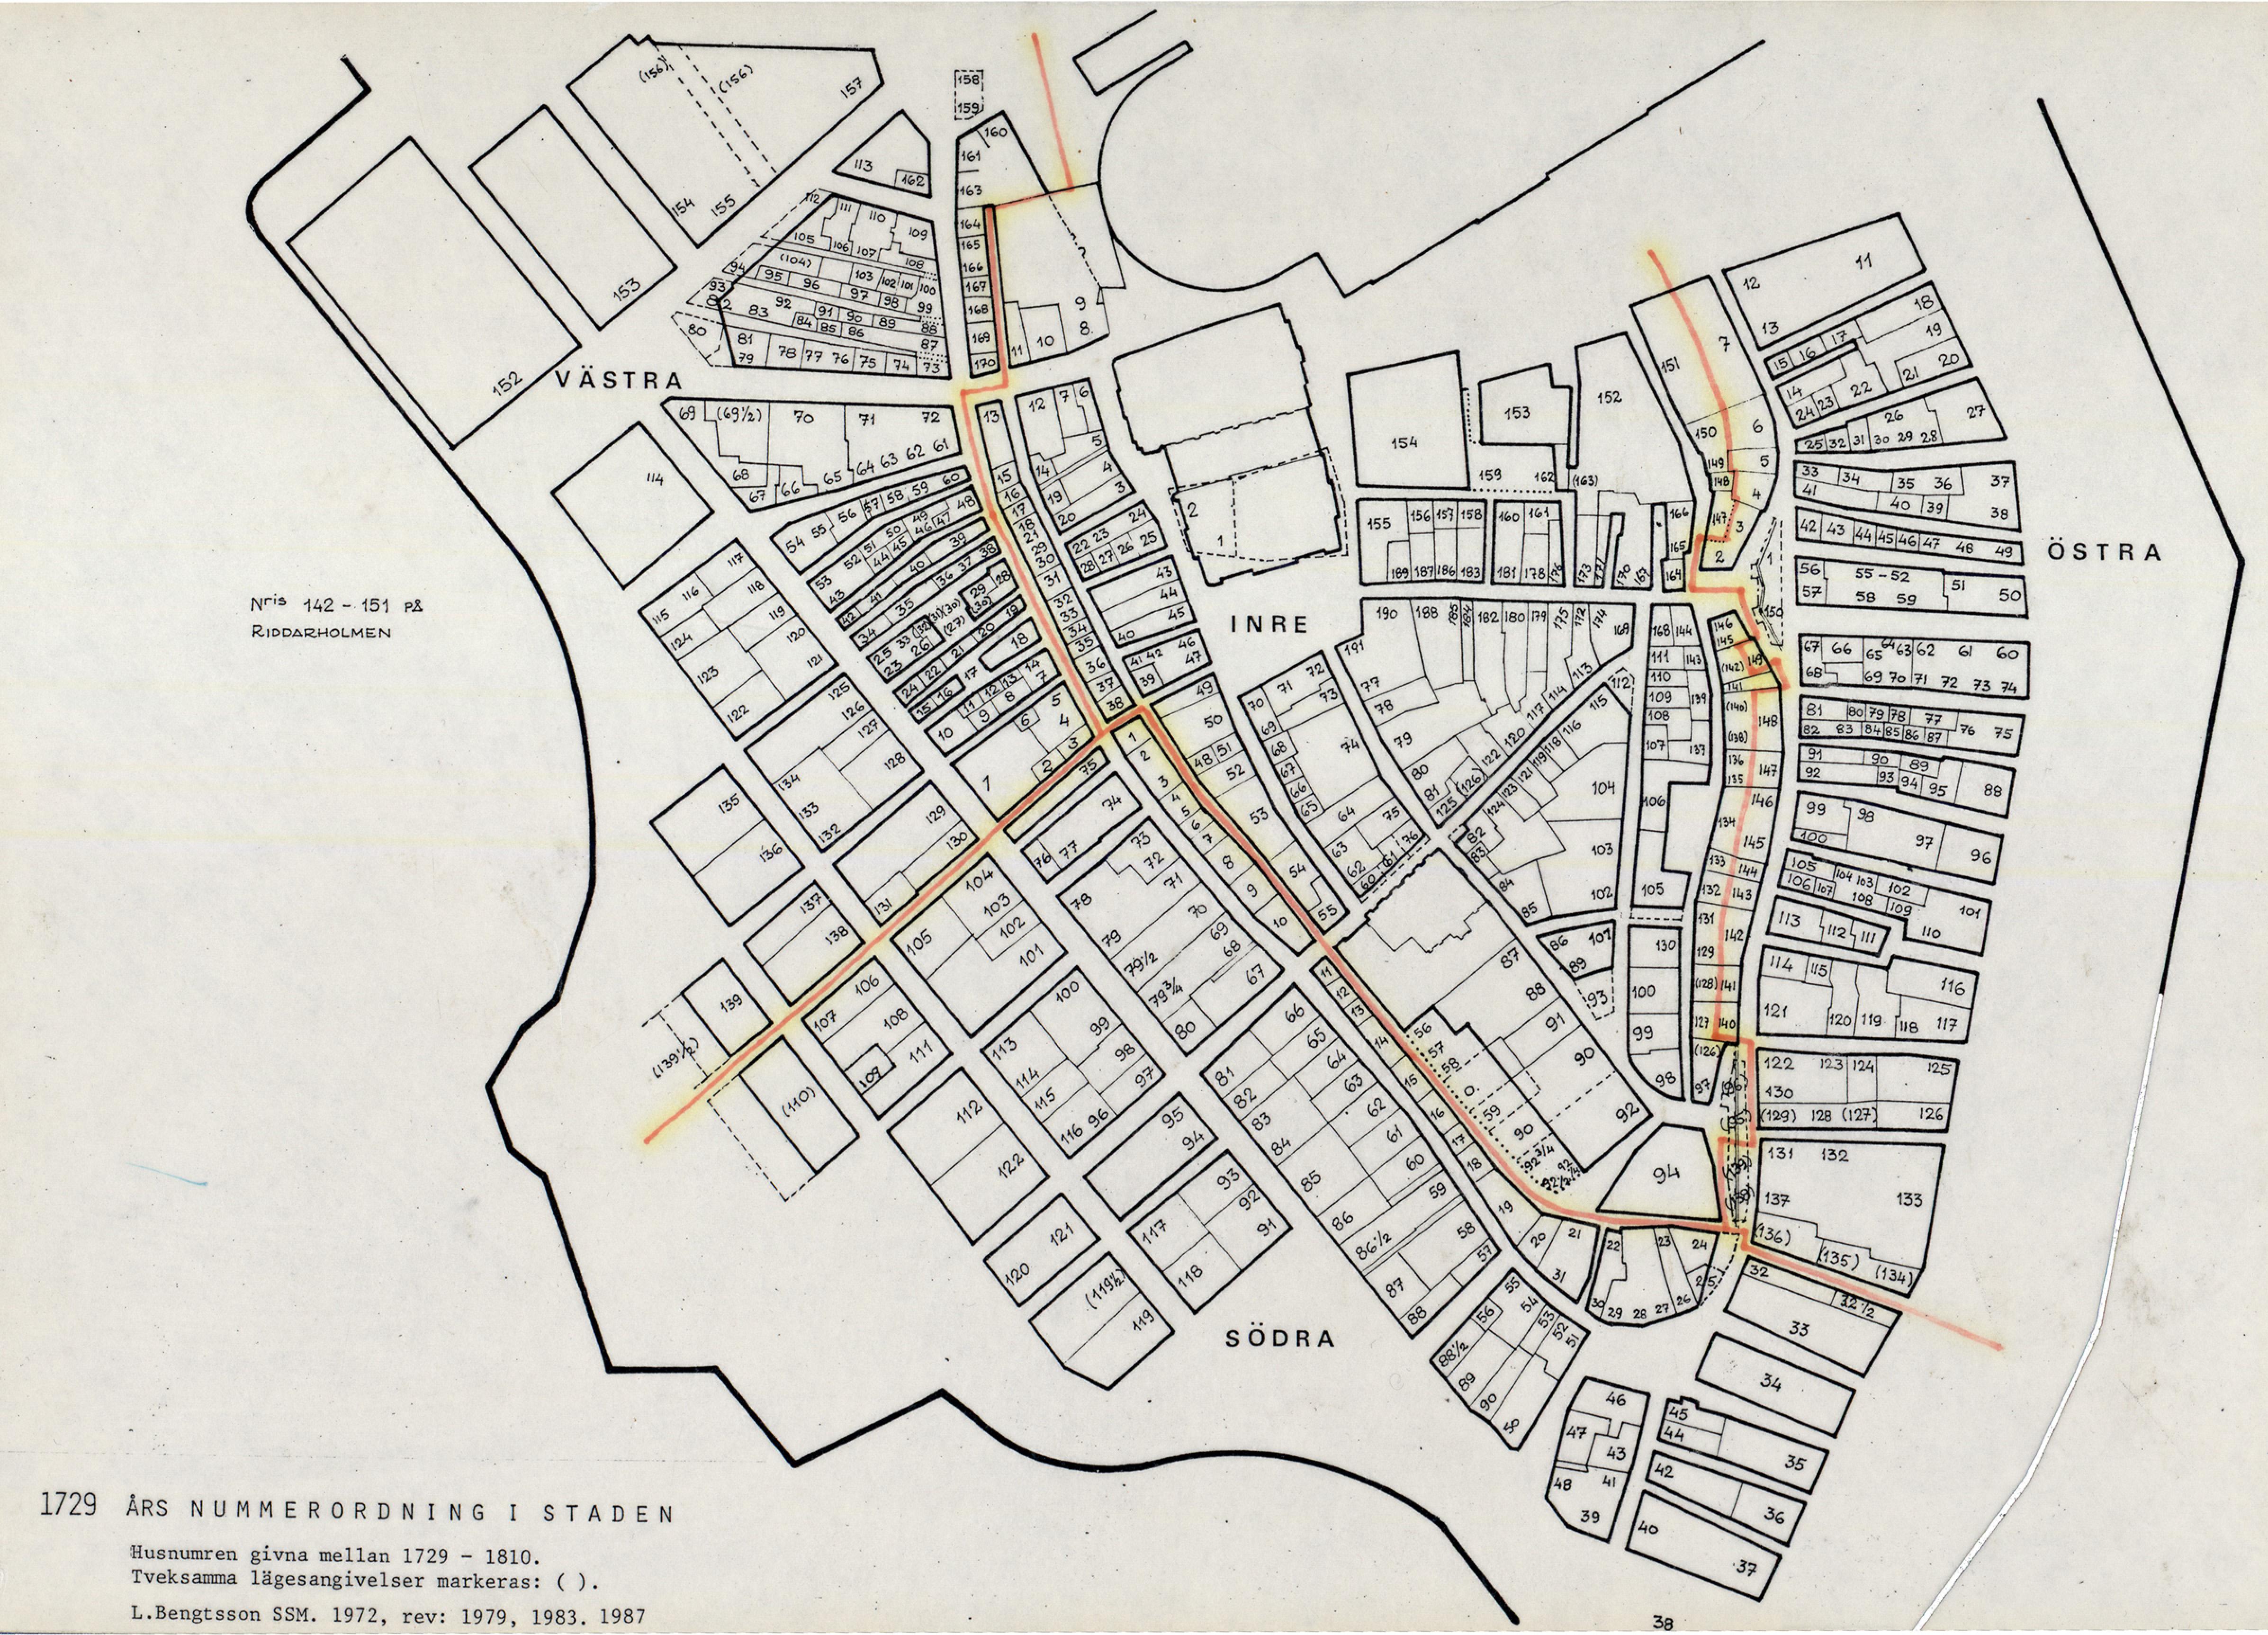 gamla stan karta Karta över Gamla stan 1729 års tomtnummer   Stockholmskällan gamla stan karta